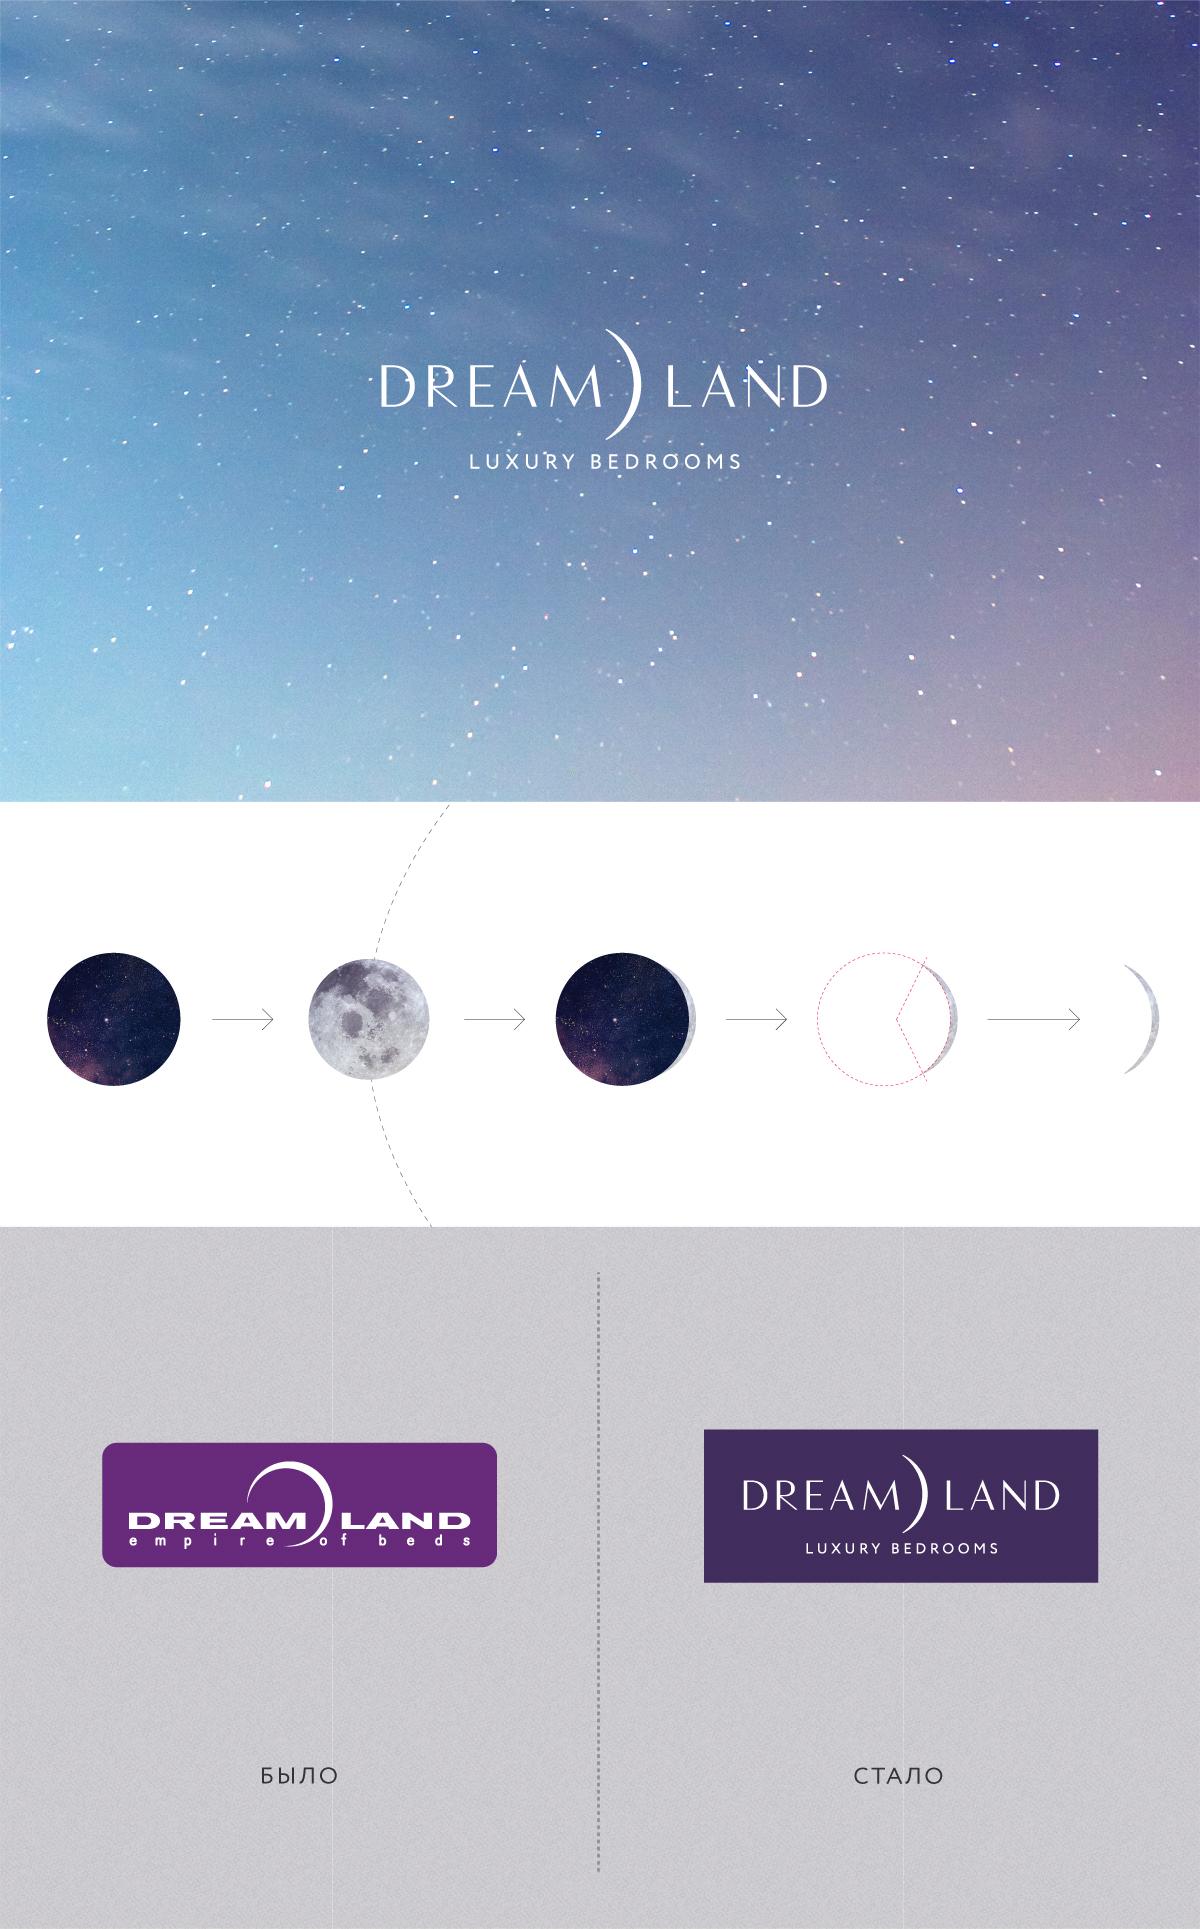 Эволюция дизайна логотипа бренда Dream Land